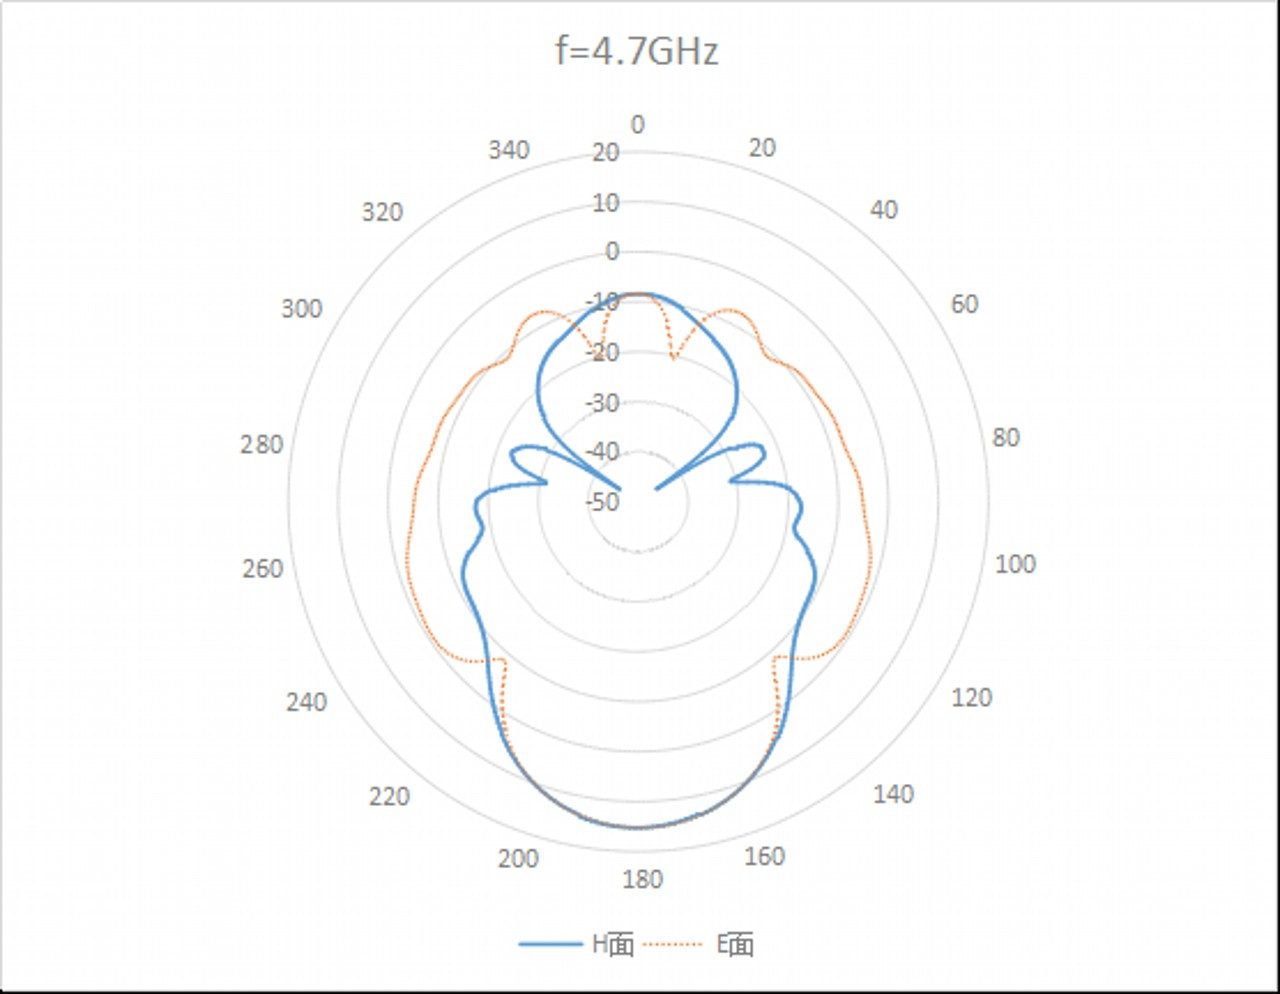 WR-159 Waveguide Standard Gain Horn Antenna. Nominal Gain: 15 dBi Gain. Frequency Range: 4.9 GHz to 7.1 GHz - 1